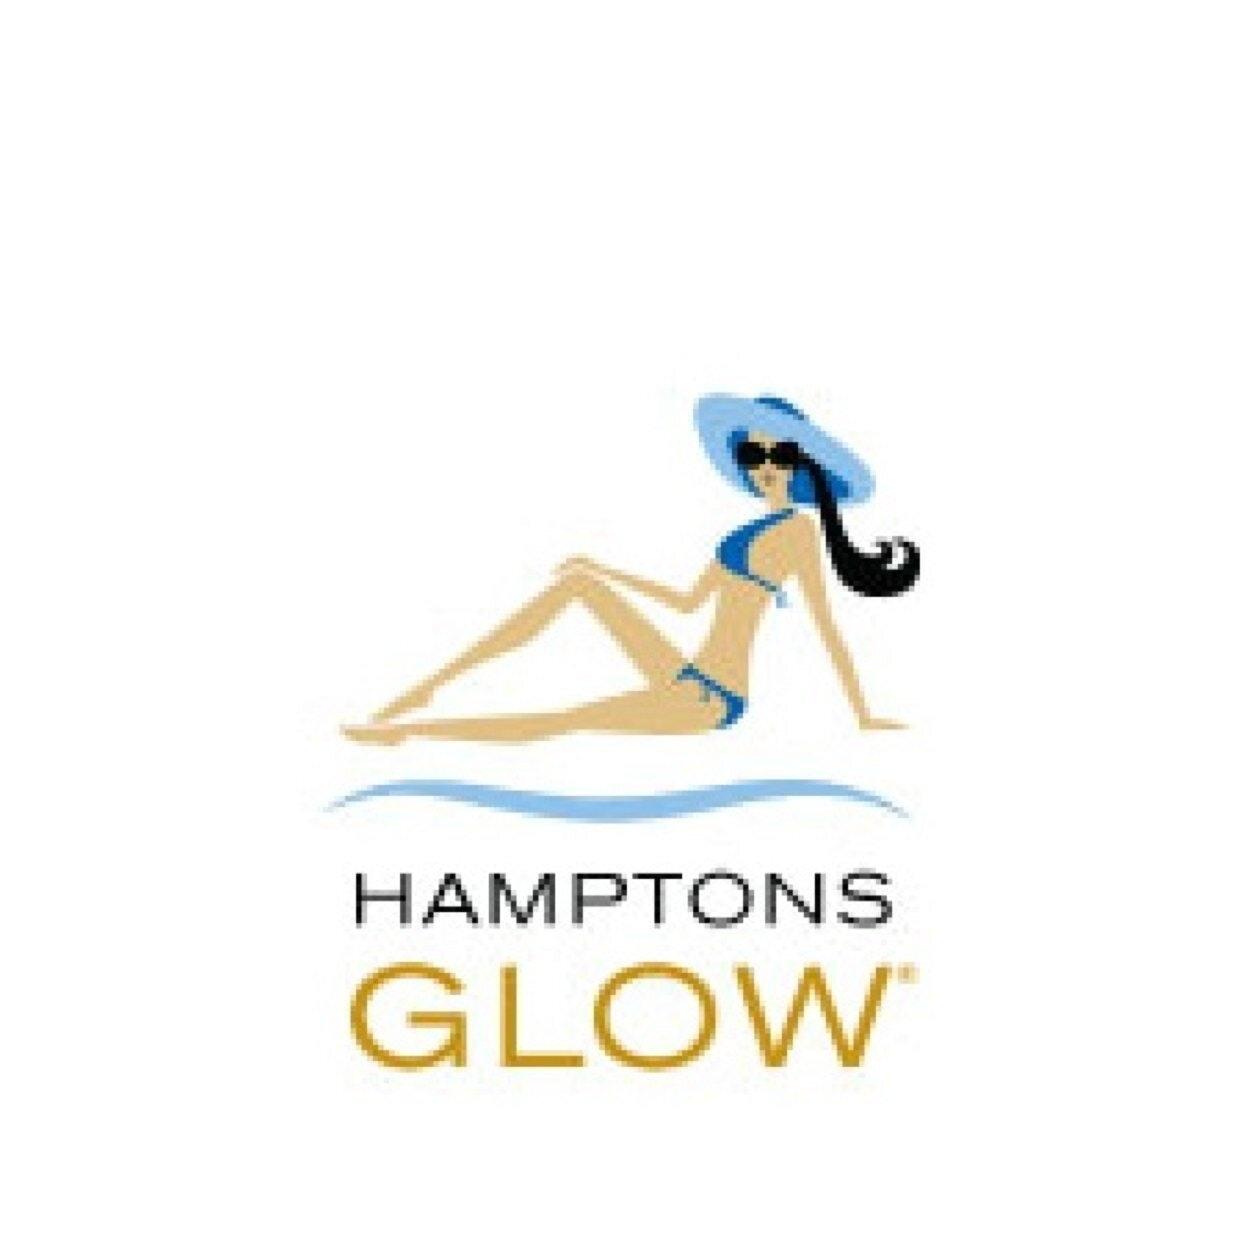 Hamptons Glow™